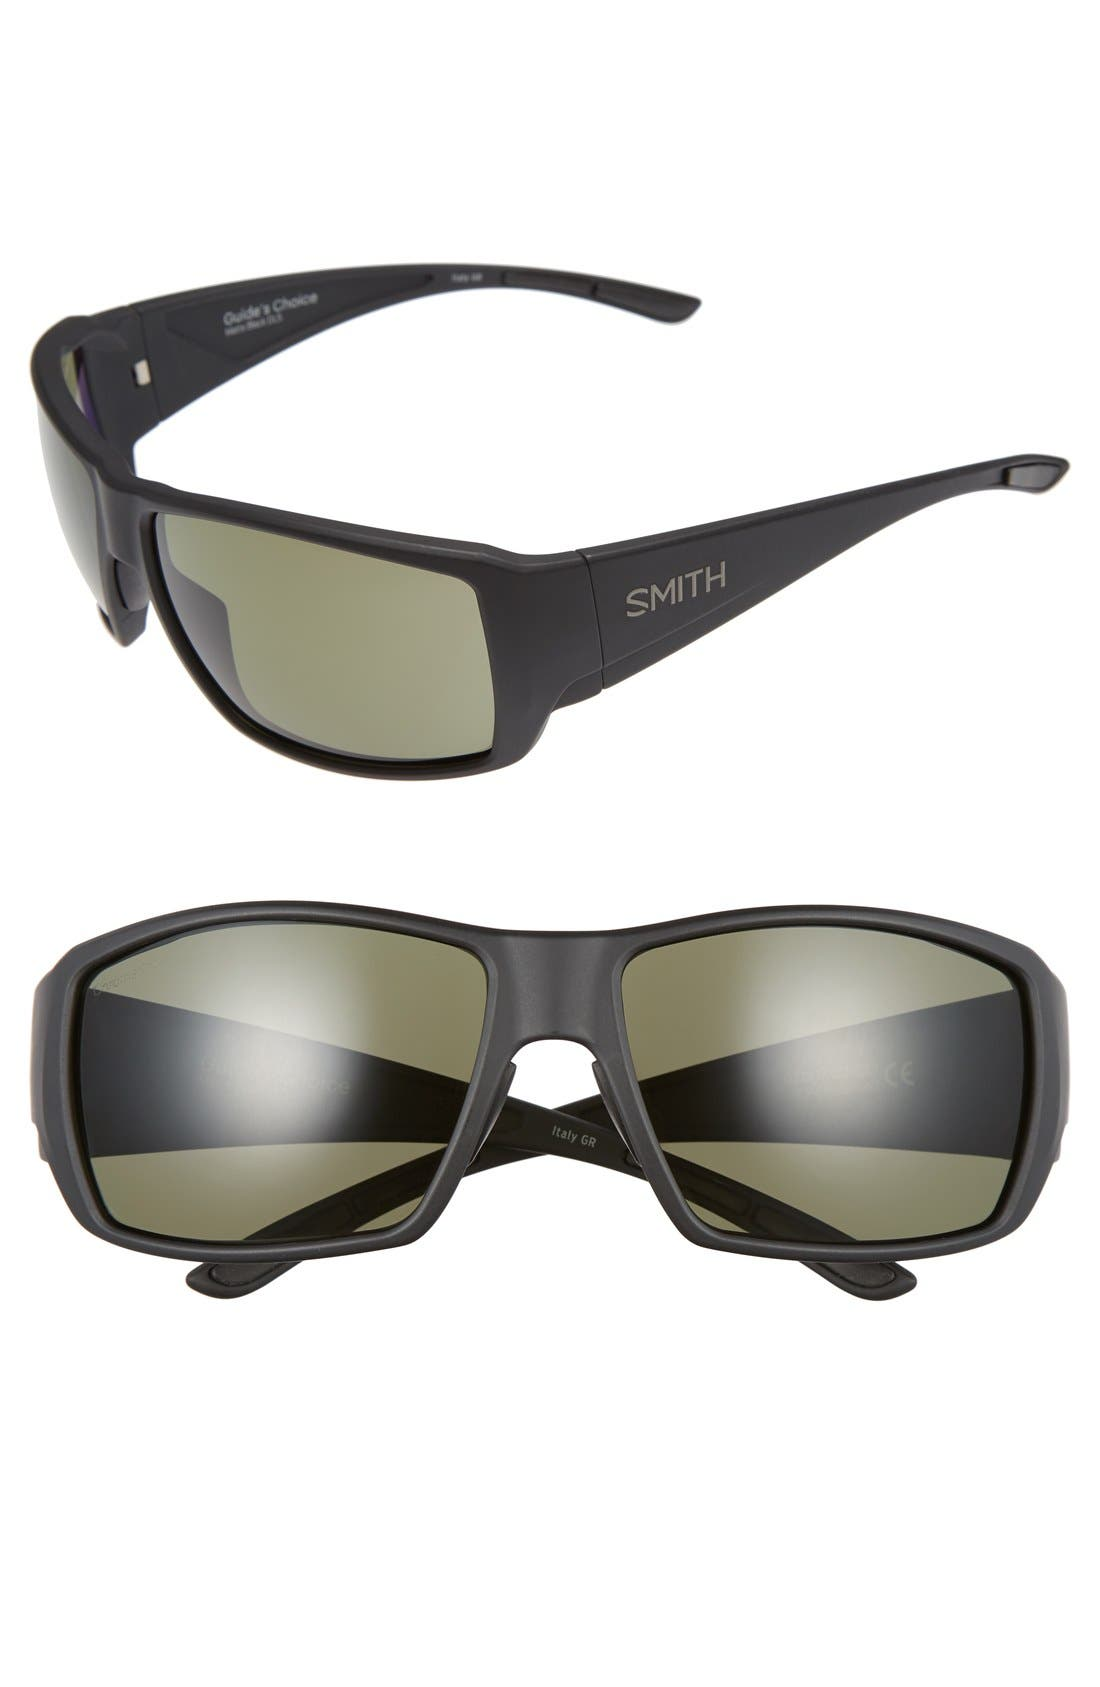 'Guide's Choice' 62mm Polarized Sunglasses,                             Alternate thumbnail 2, color,                             MATTE BLACK